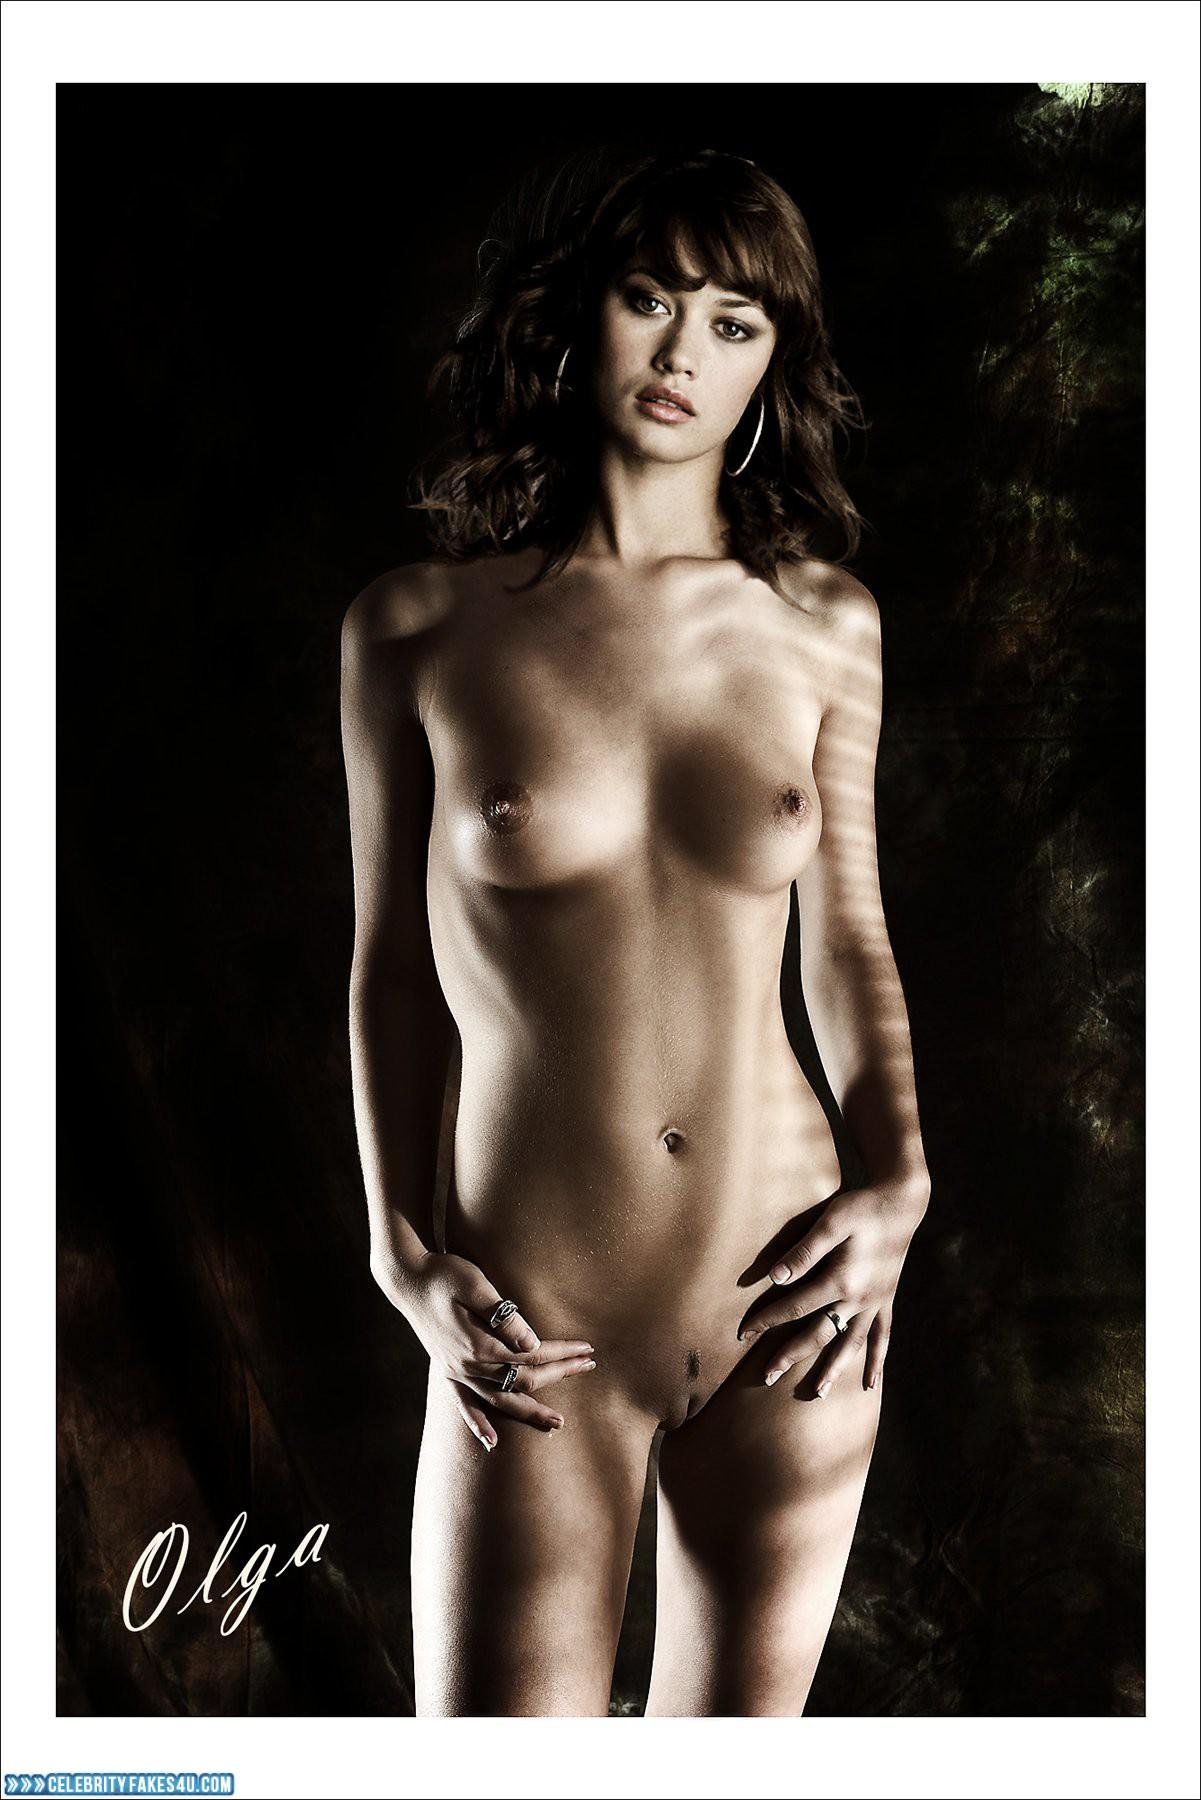 Actriz Porno Olga olga kurylenko nude body tits celebrityfakes u com gallery